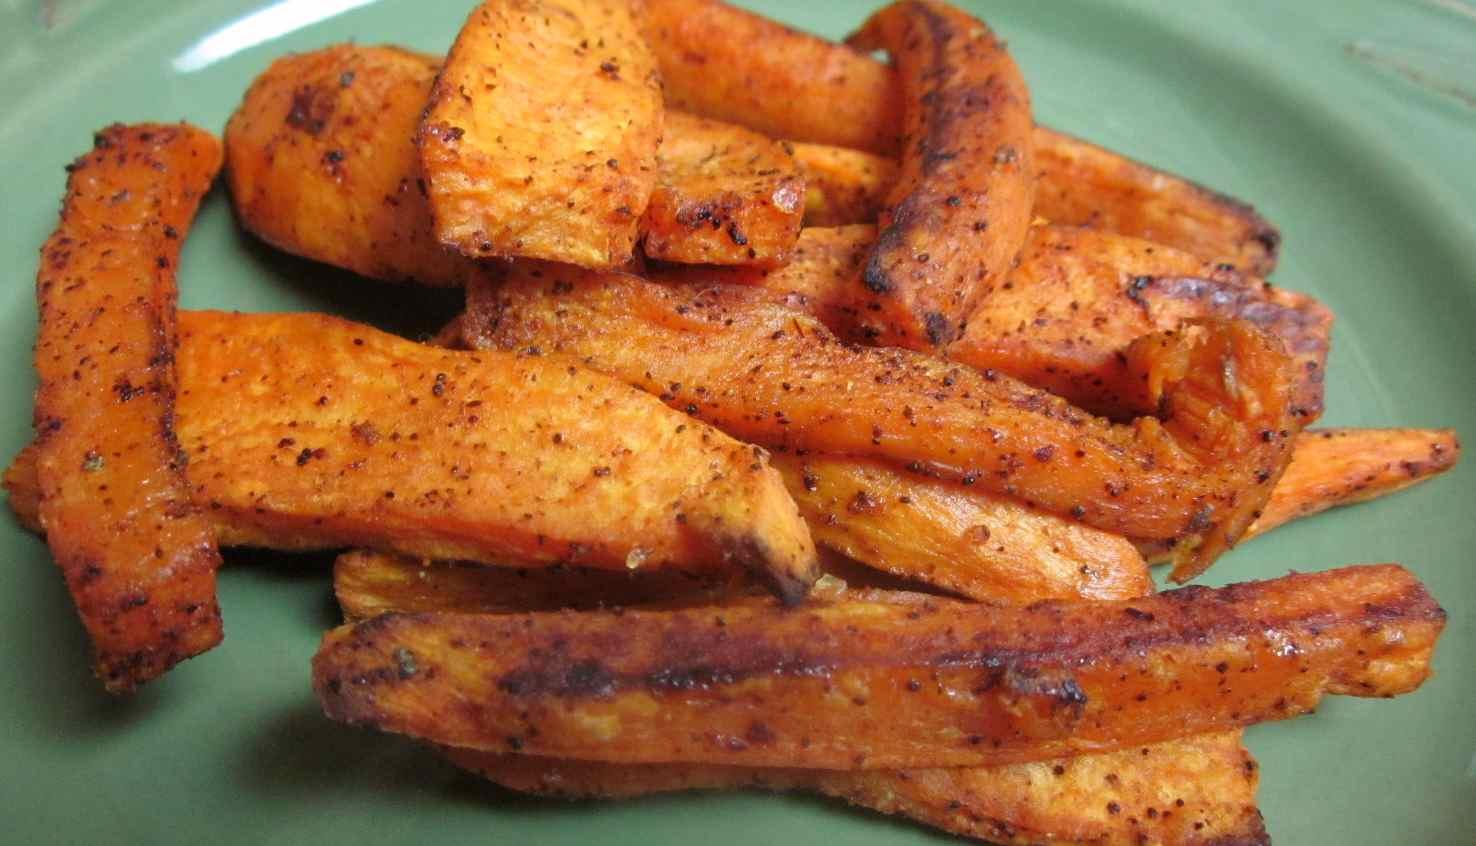 Karen's Vegan Kitchen: Hot, Sweet & Spicy Garnet Yam Fries